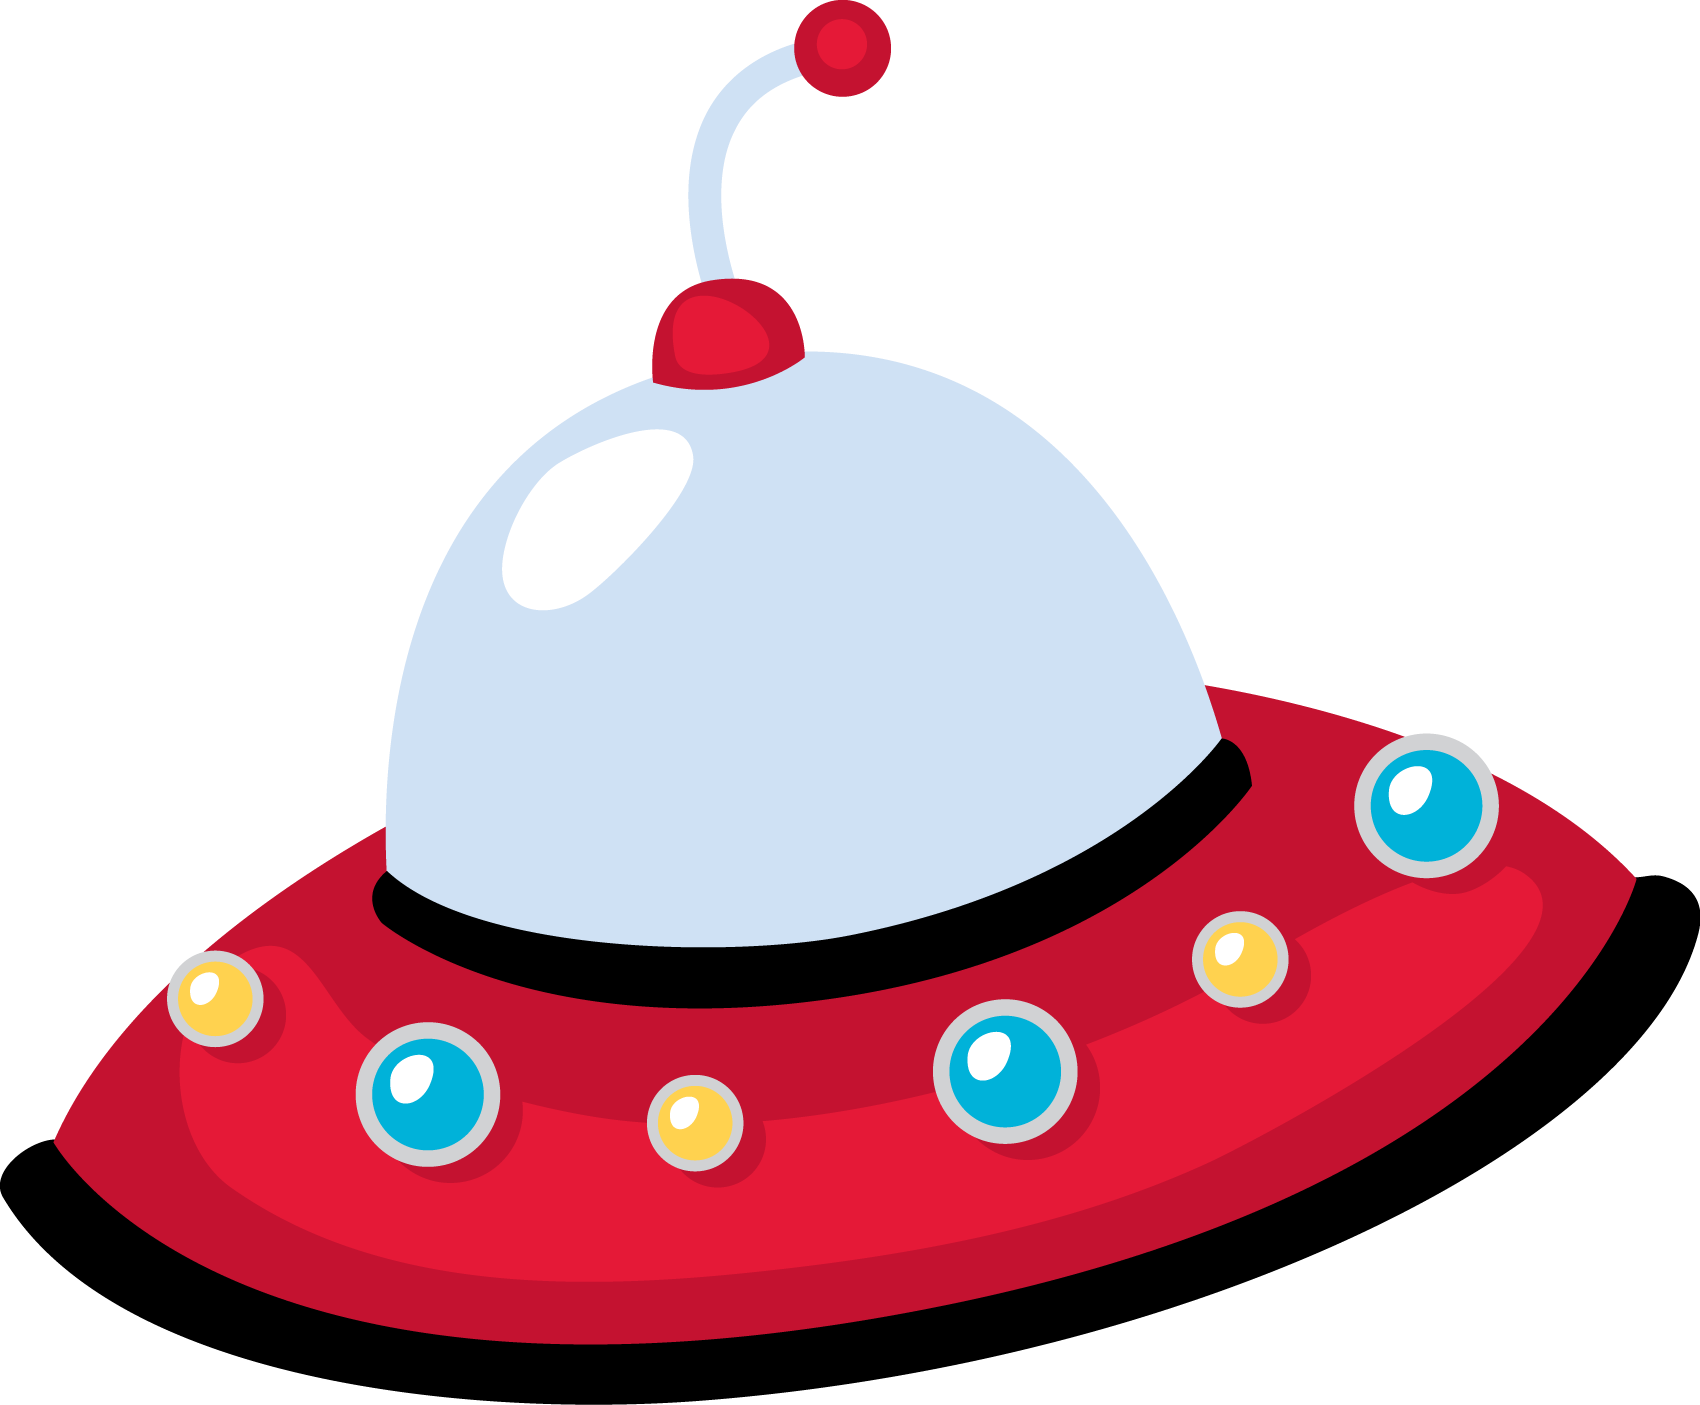 Pin by elizabeth campana. Galaxy clipart rocket ship